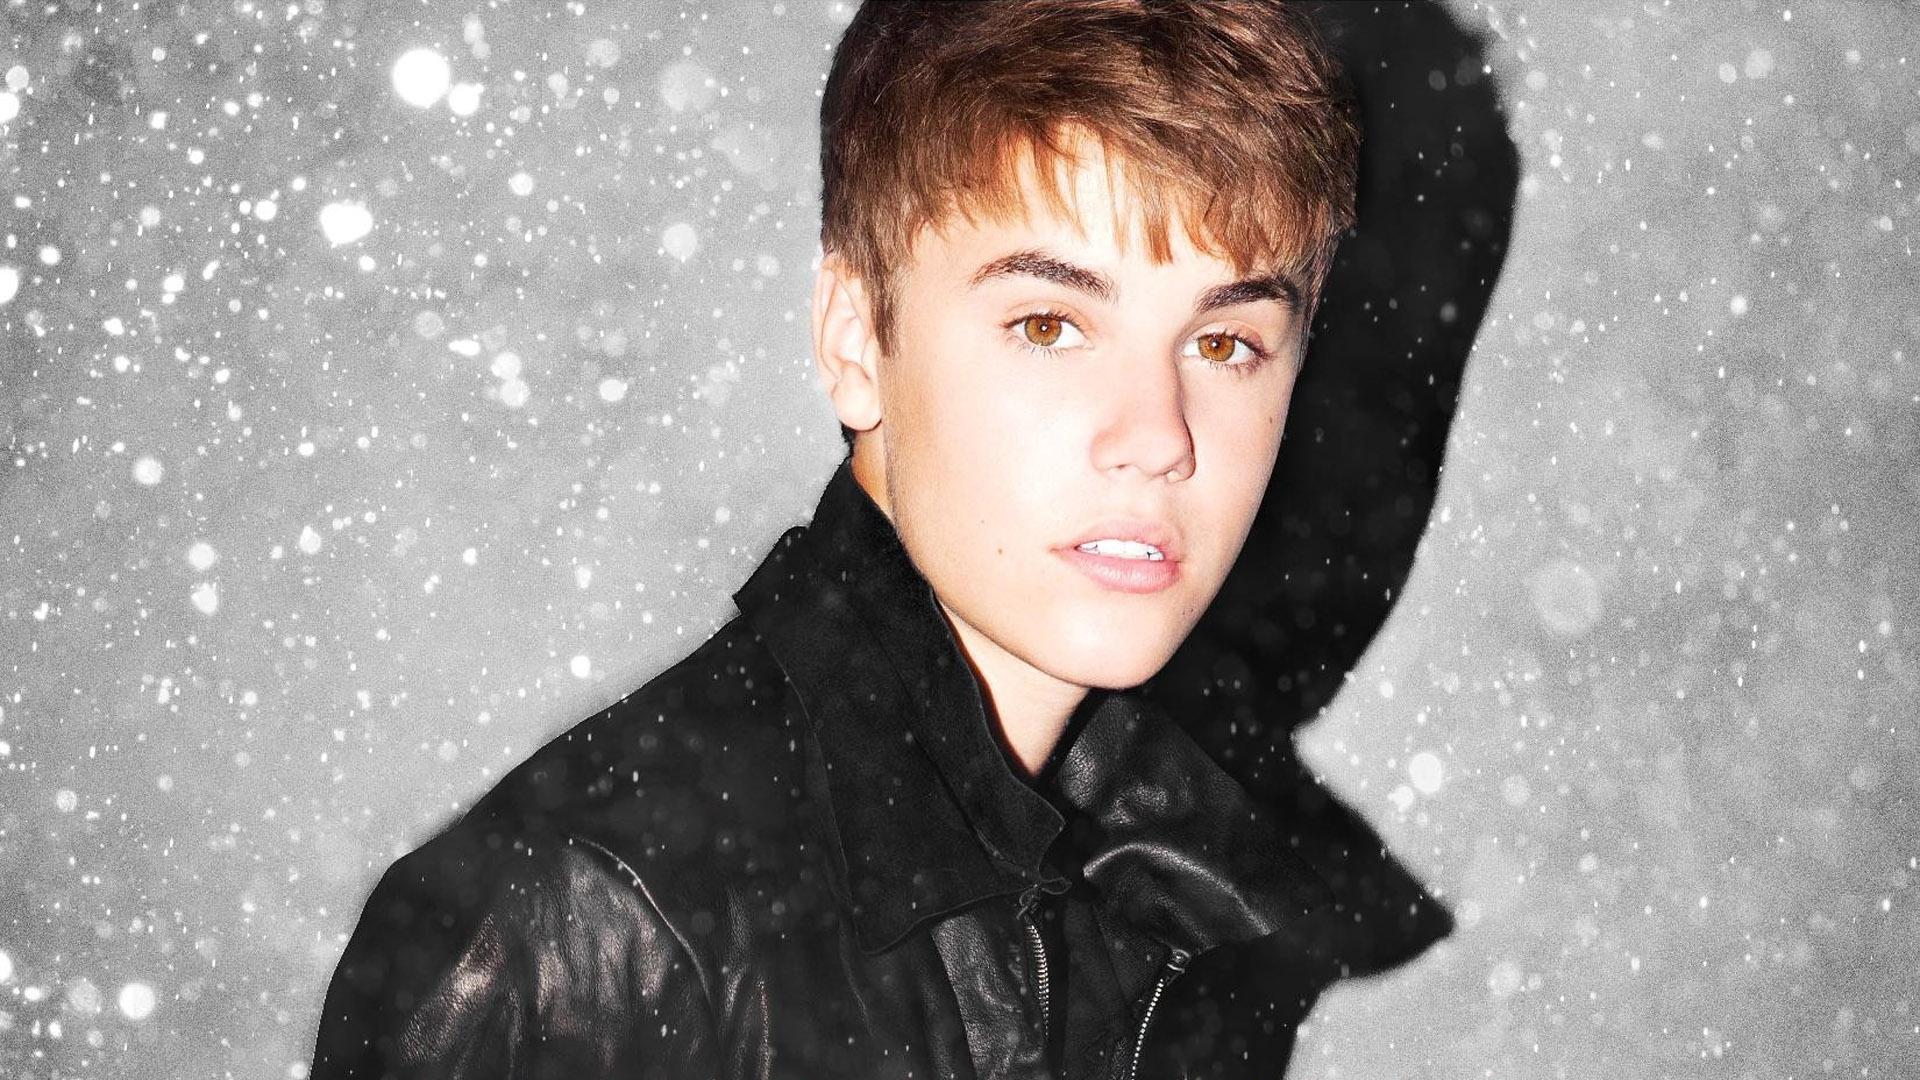 Justin Bieber Wallpapers Download Desktop Wallpaper Images 1920x1080